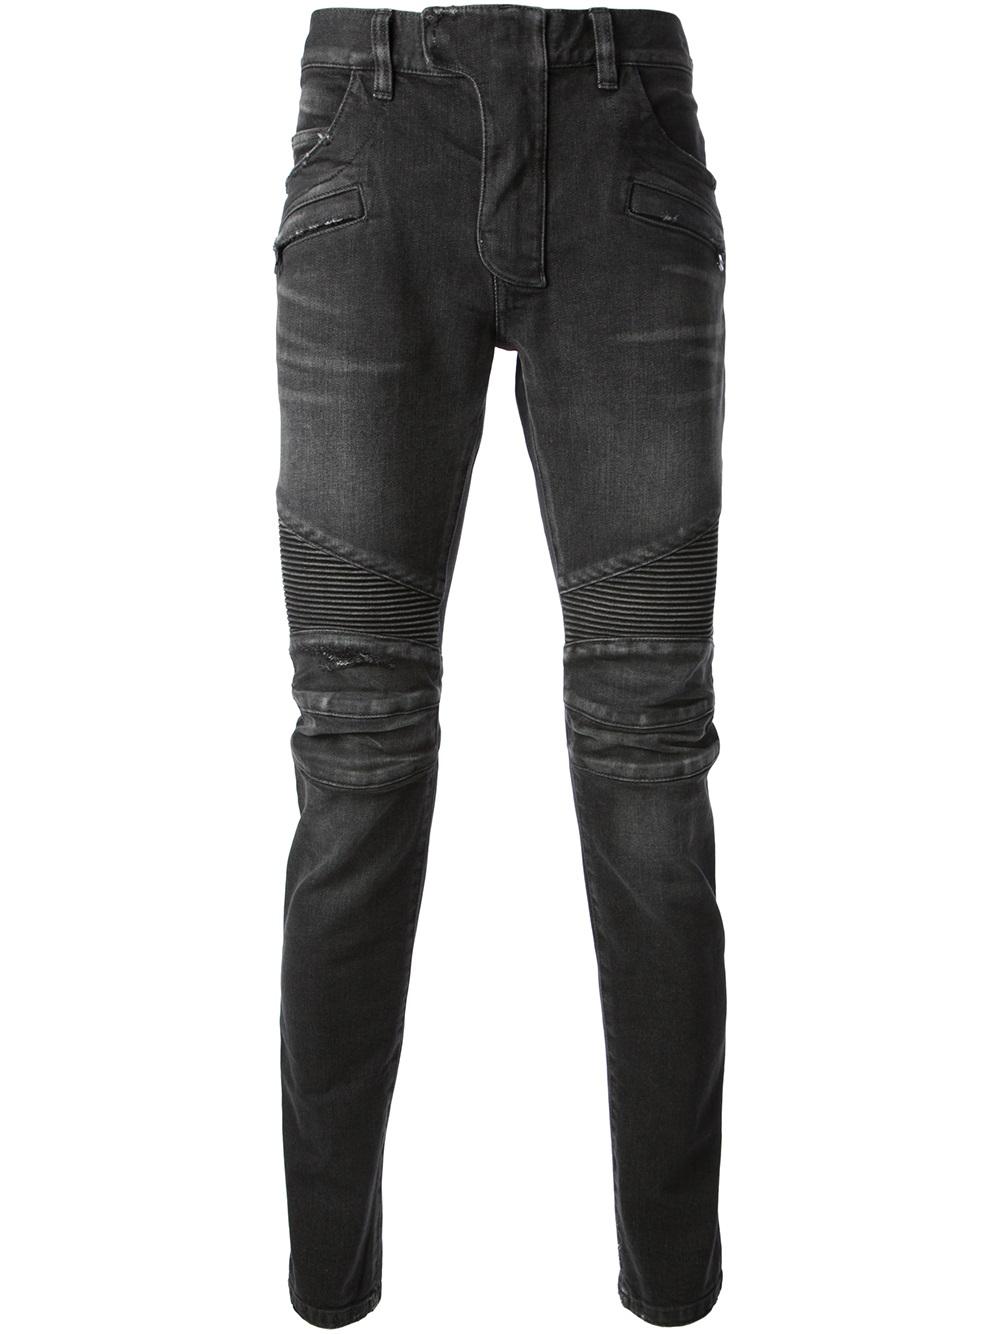 Balmain Skinny Moto Jeans in Black for Men | Lyst